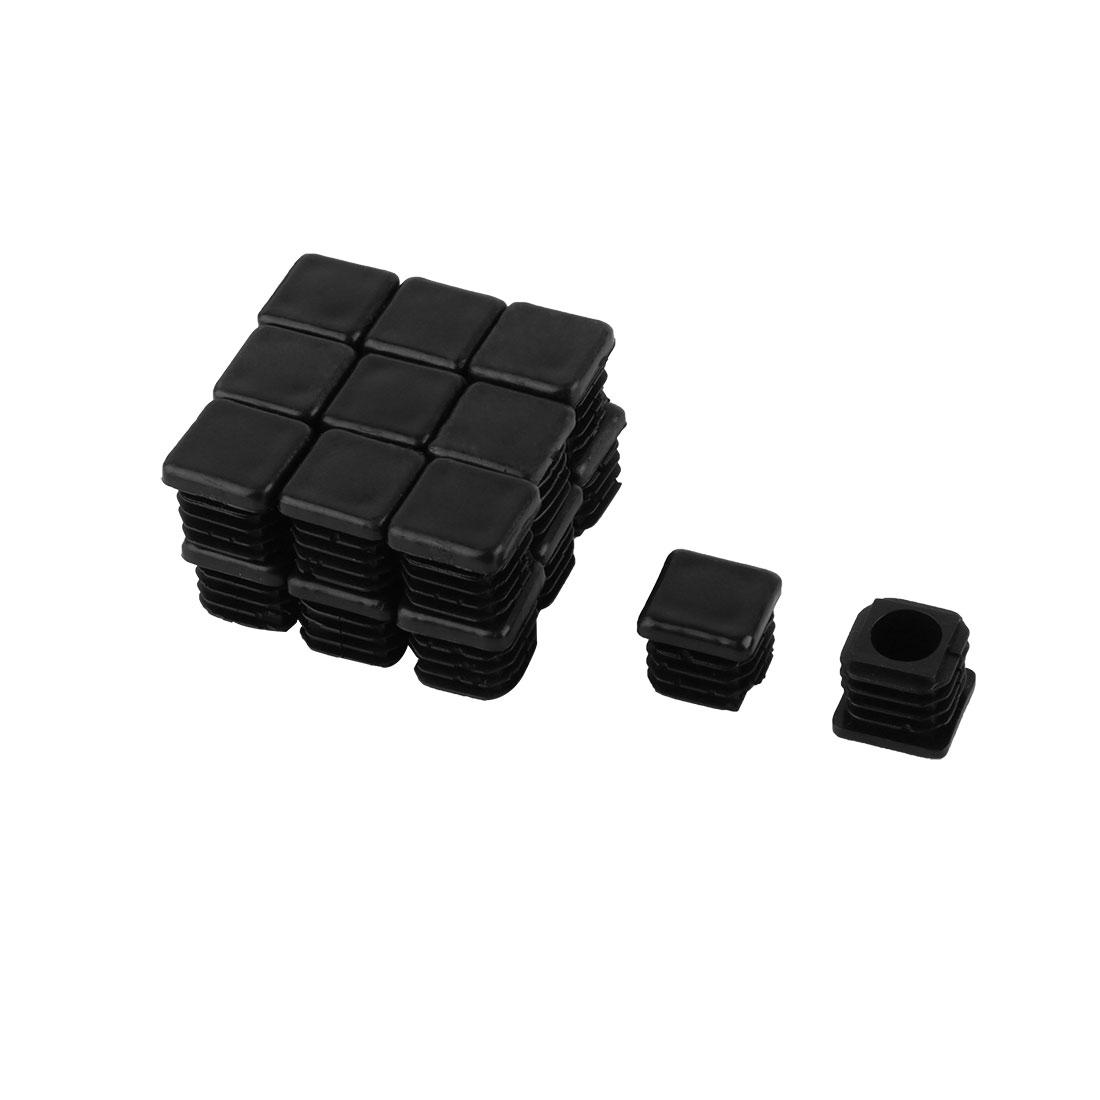 20mm x 20mm Plastic Square Tube Inserts End Black Blanking Caps 20 Pcs